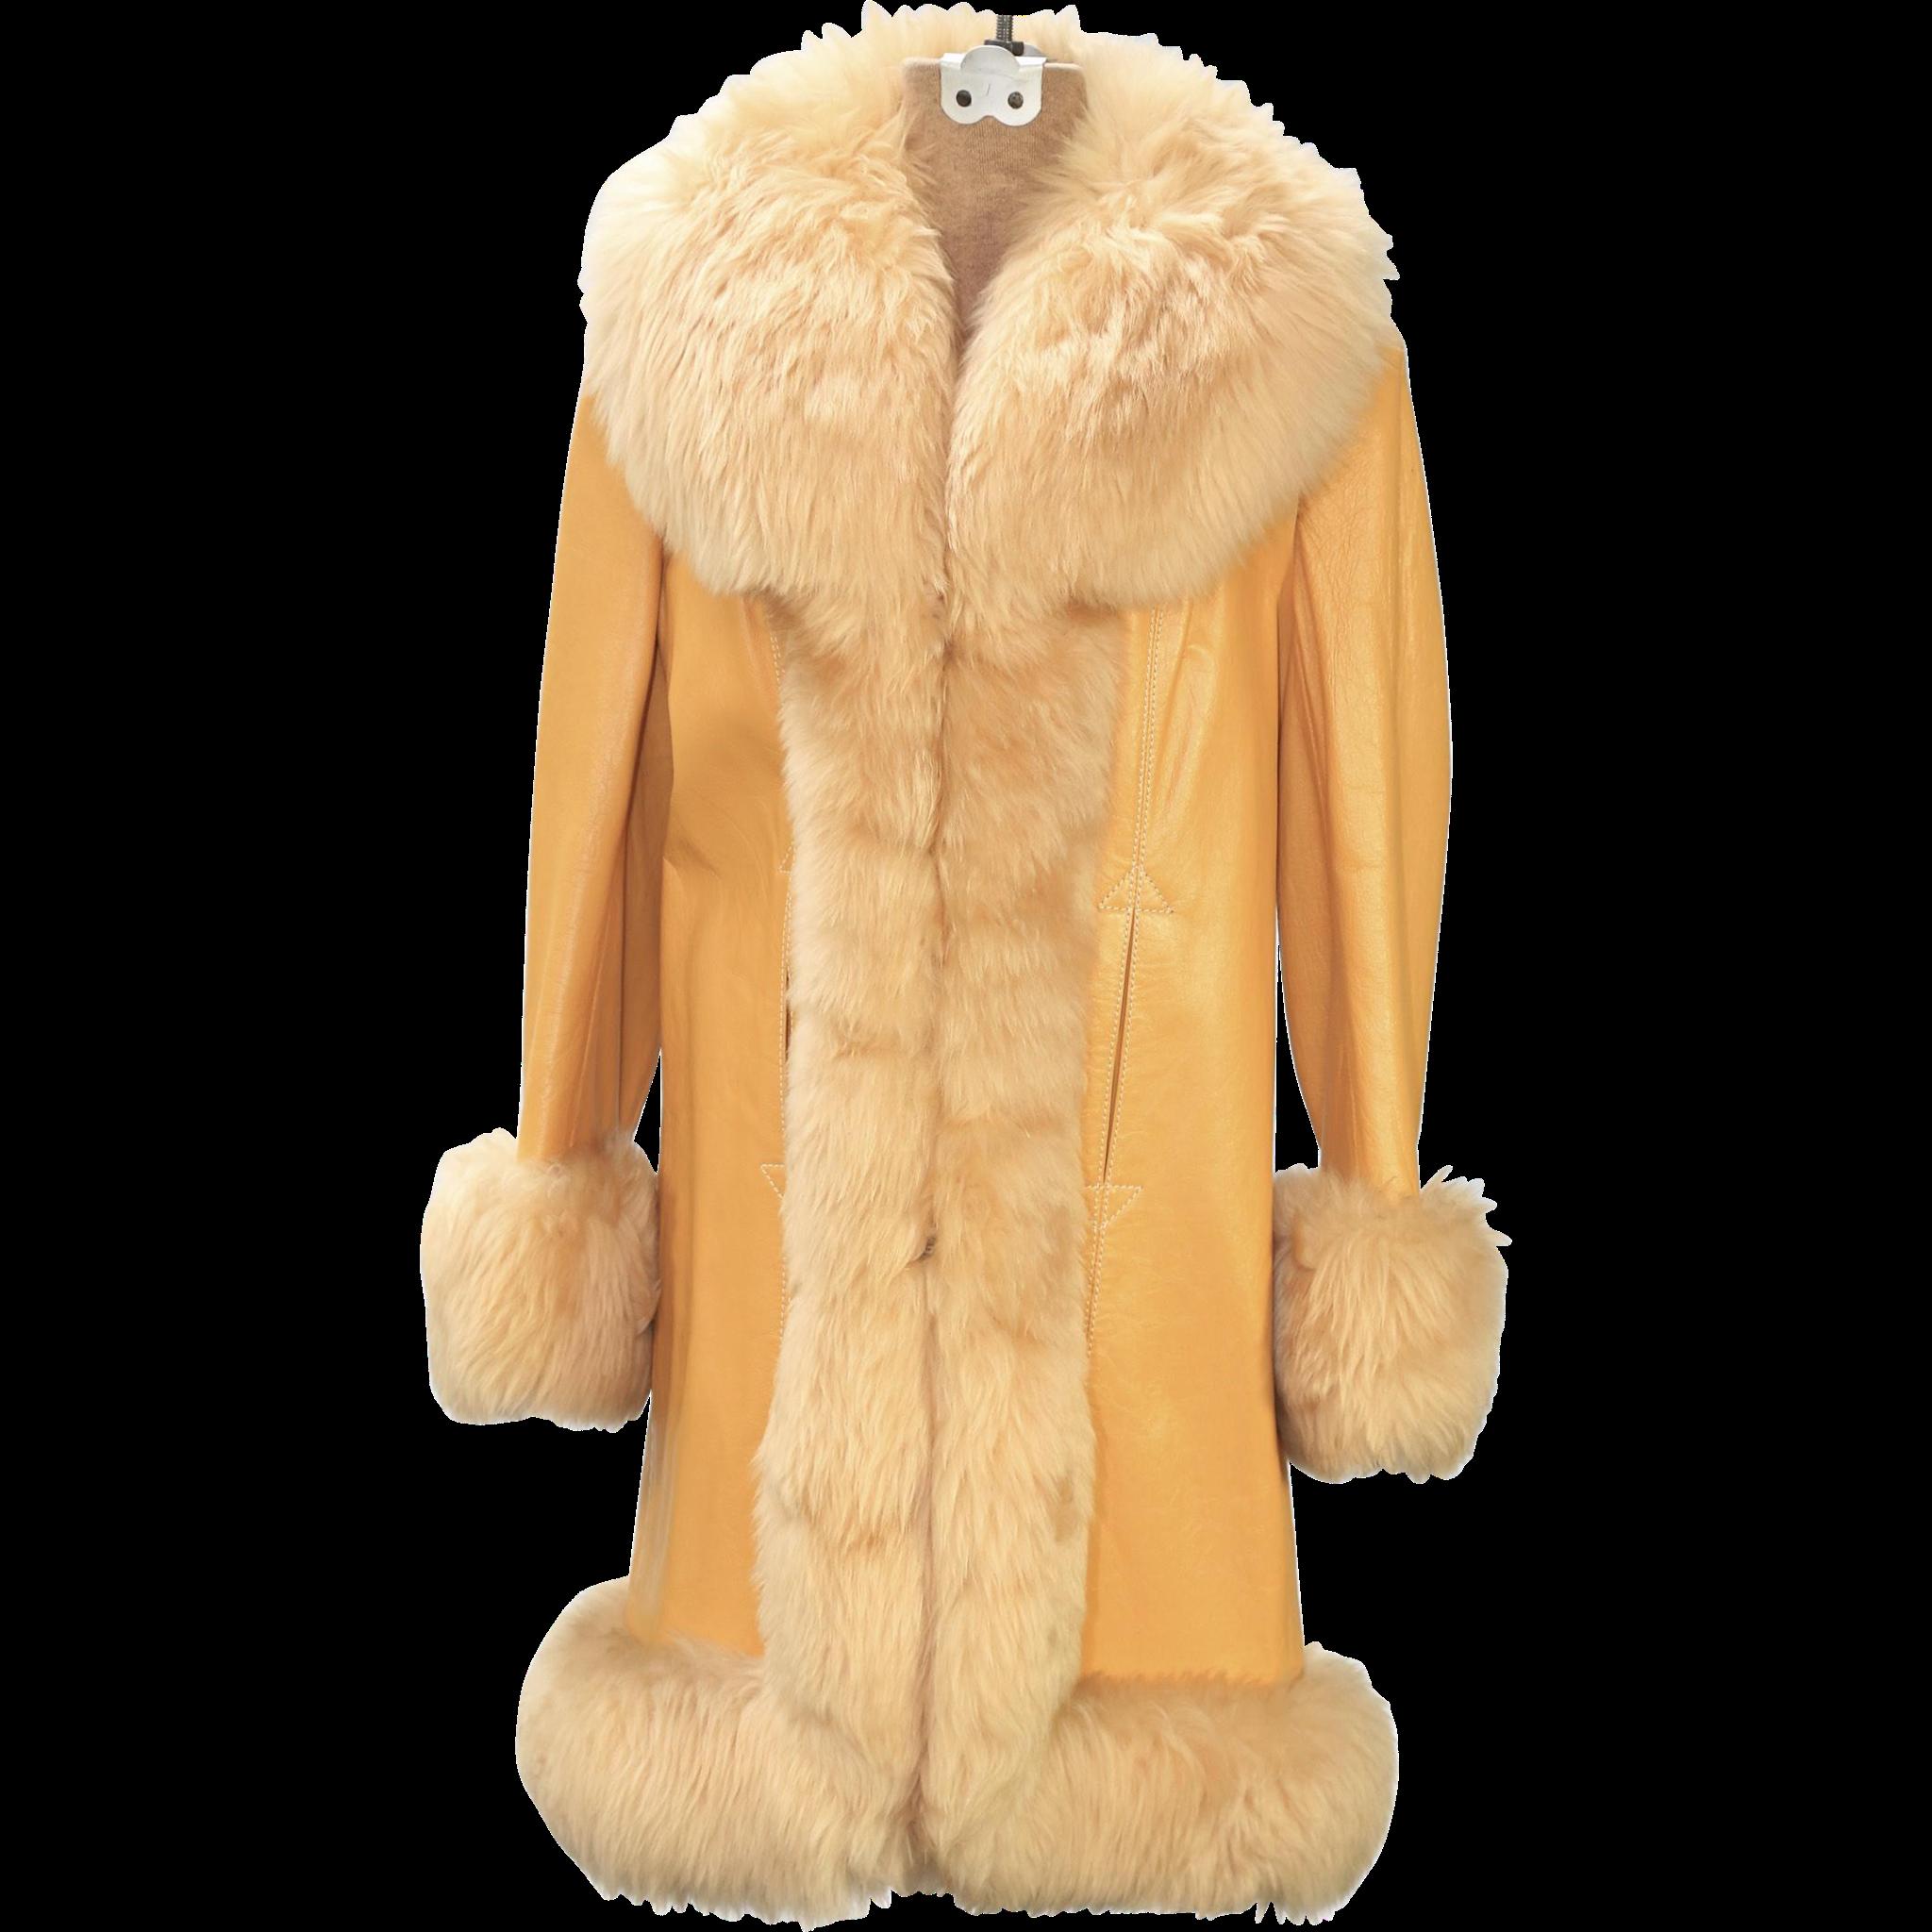 Vintage Butterscotch Leather & Shearling Coat Jacket Lantry ...